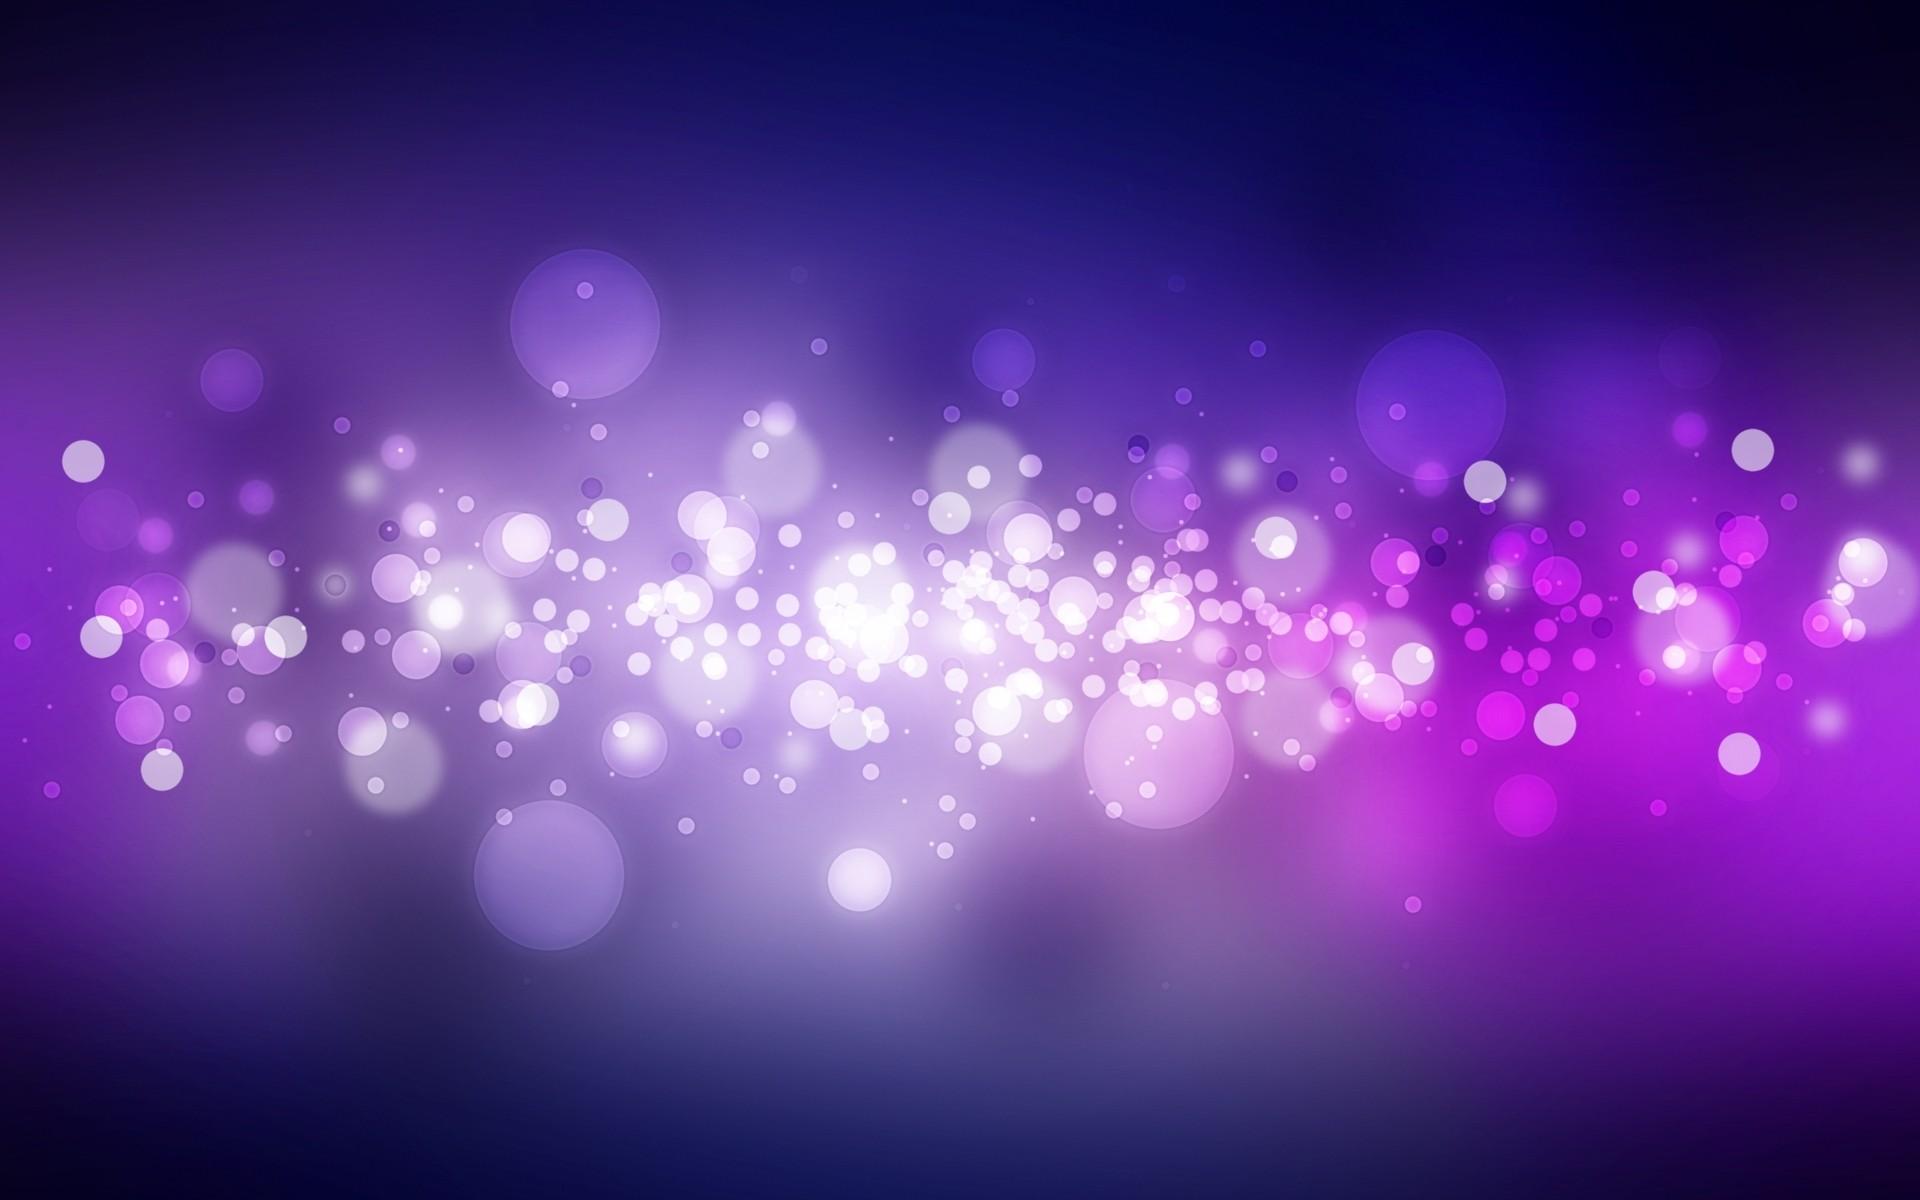 Purple Bubbles Wallpaper